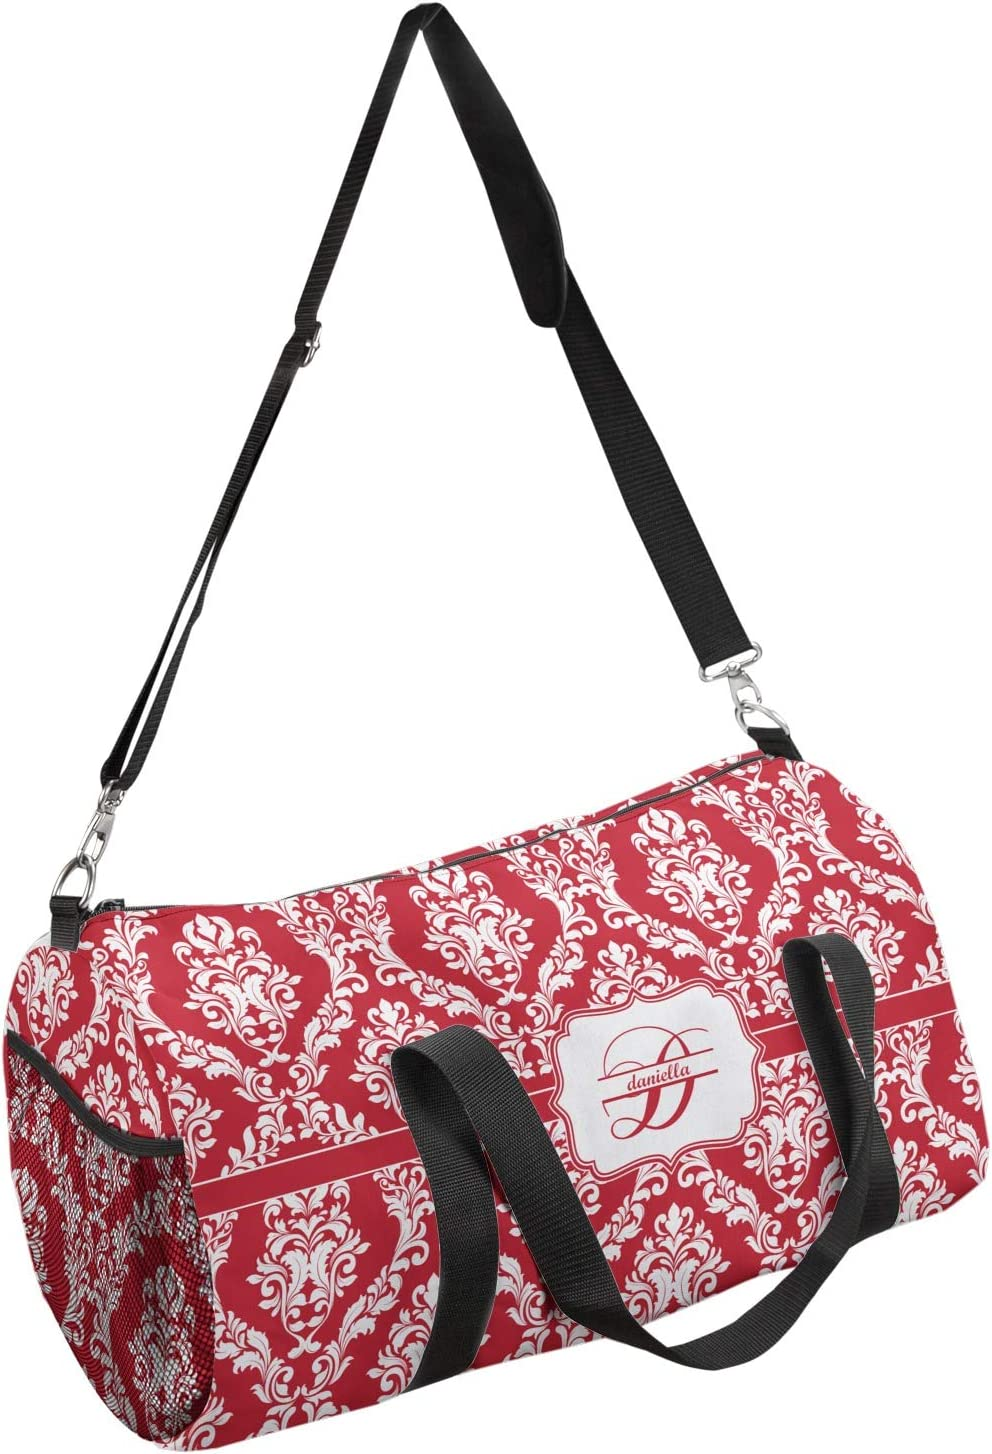 Personalized YouCustomizeIt Damask Duffel Bag